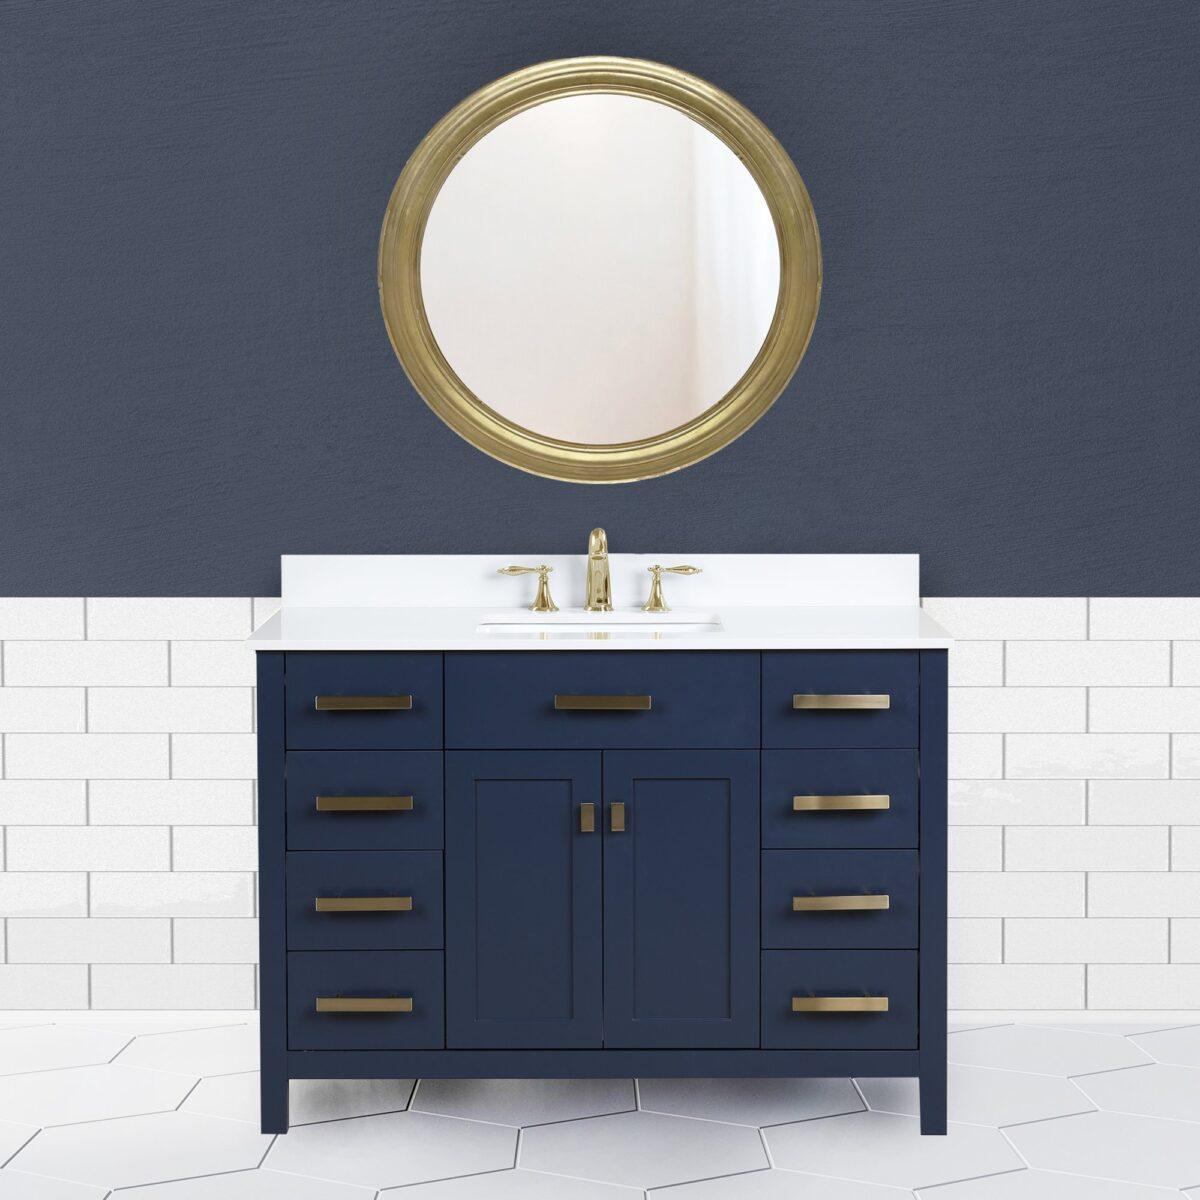 bagno-pareti-color-blu-navy-12